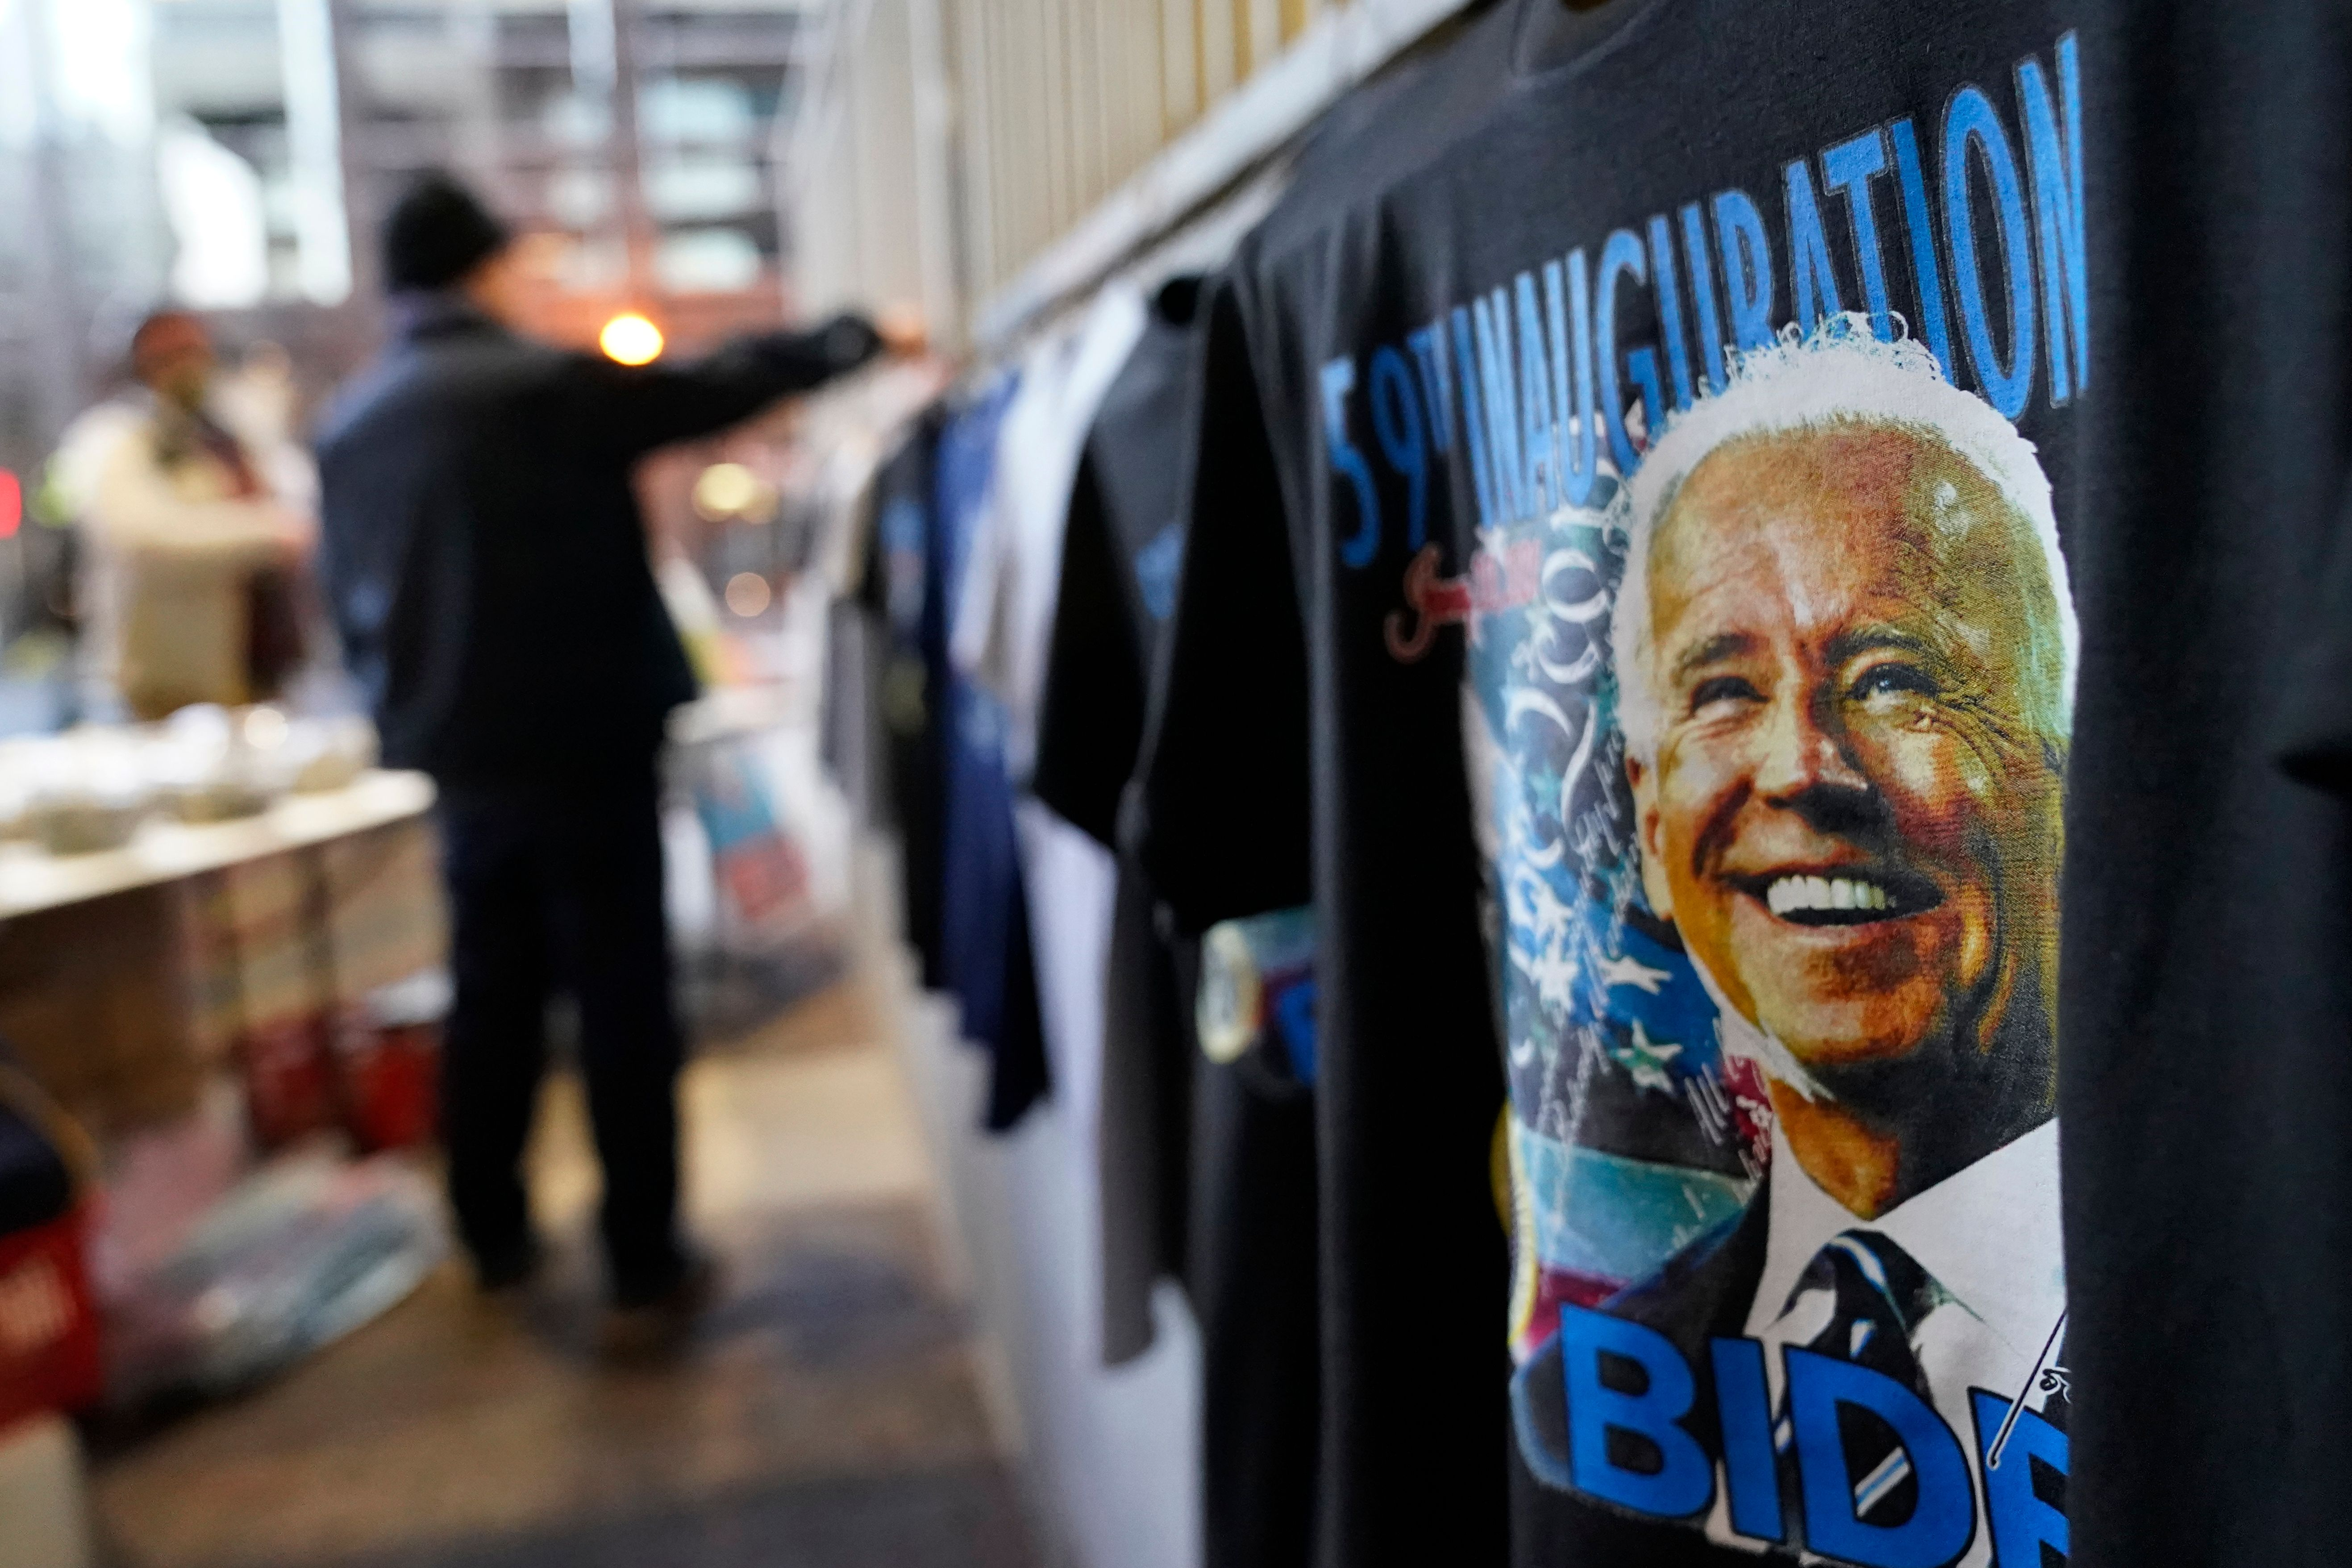 Mandatory Credit: Photo by David Goldman/AP/Shutterstock (11718139ah)Gi Chung sets up his souvenir stand with Joe Biden memorabilia ahead of President-elect Joe Biden's inauguration ceremony, in WashingtonBiden Inauguration Security, Washington, United States - 20 Jan 2021.